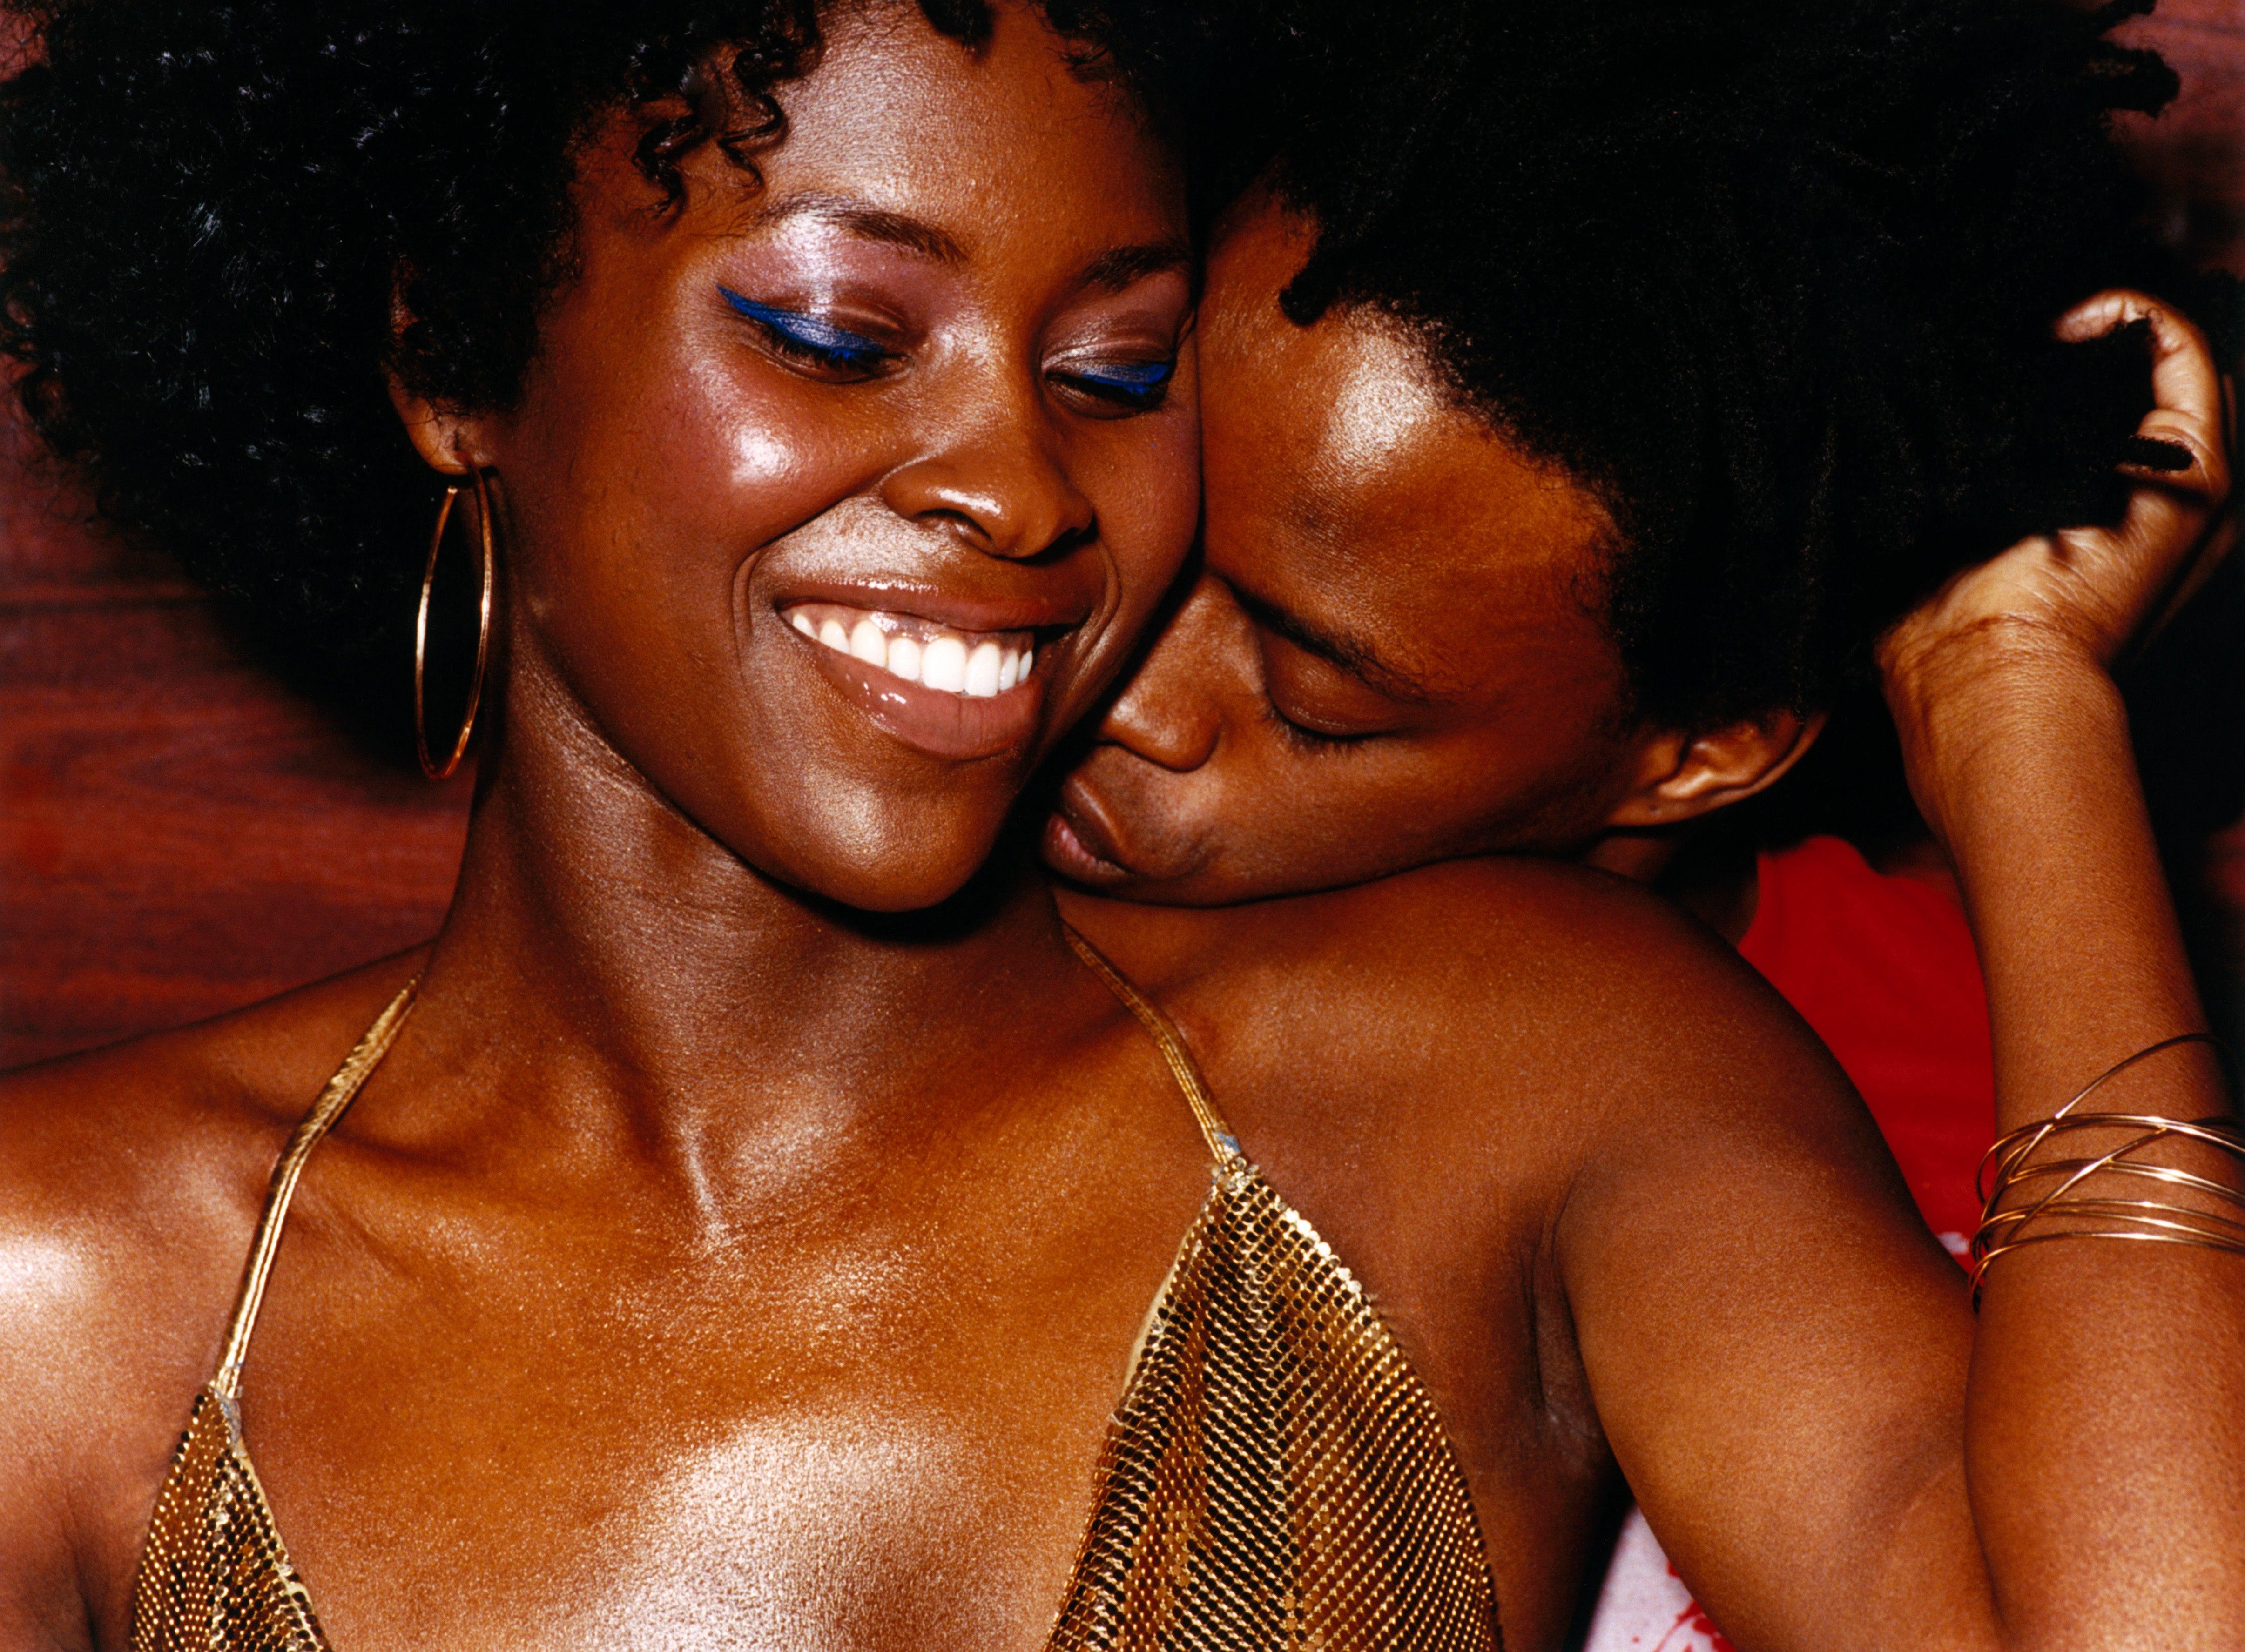 2 black women having sex free hustler porn movies